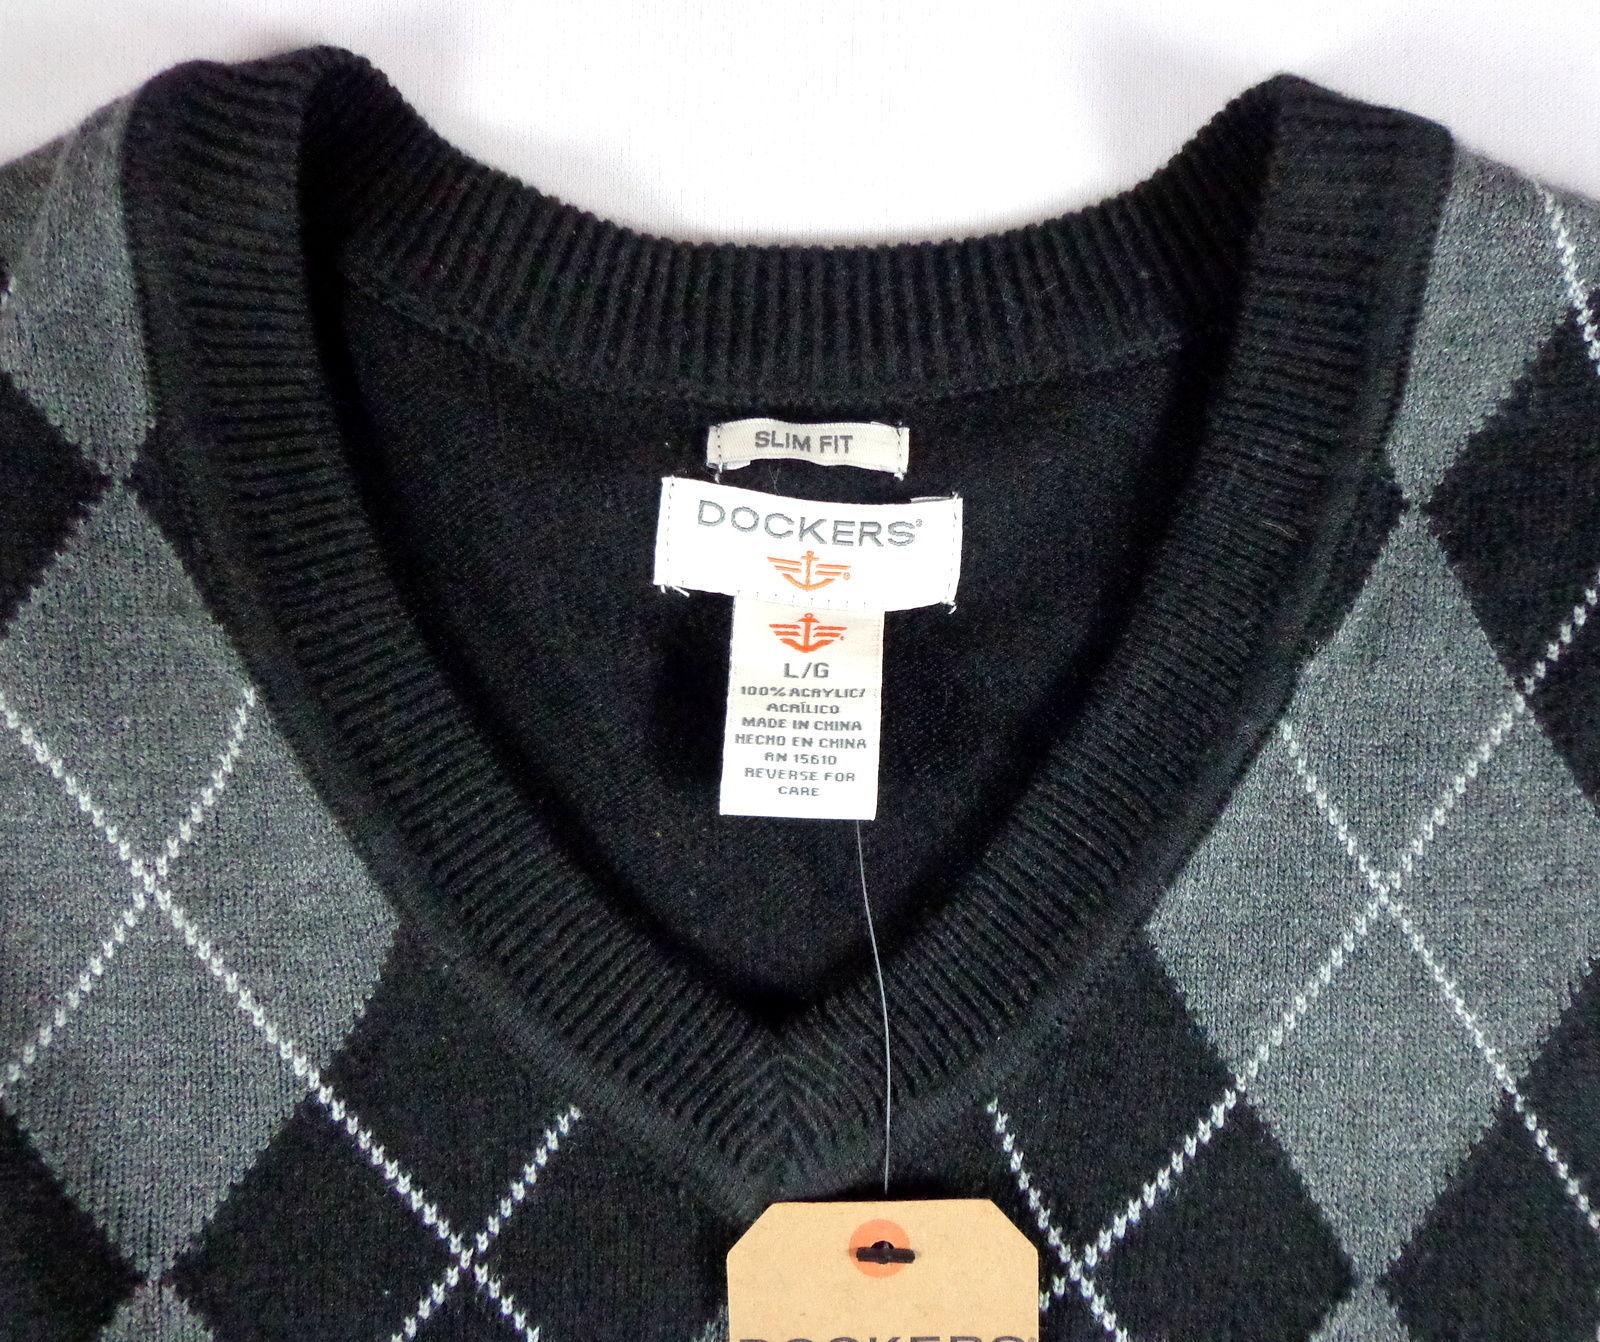 Dockers Men's Slim Fit V-Neck Sweater Vest Size L Black Gray Argyle